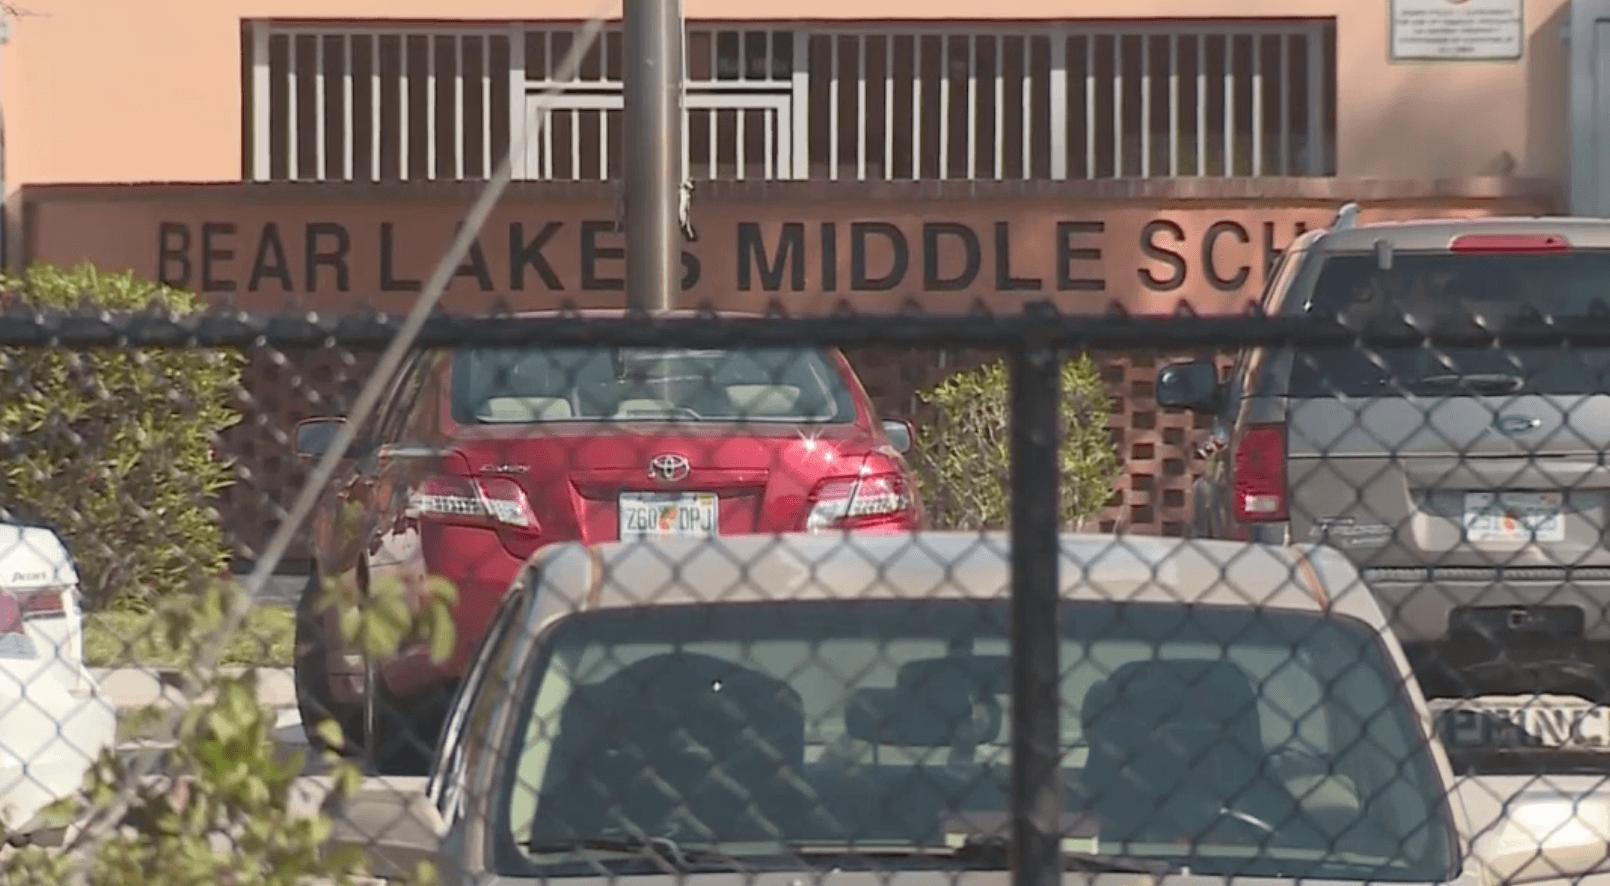 Bear Lake Middle School | Photo: Youtube/ Hail News